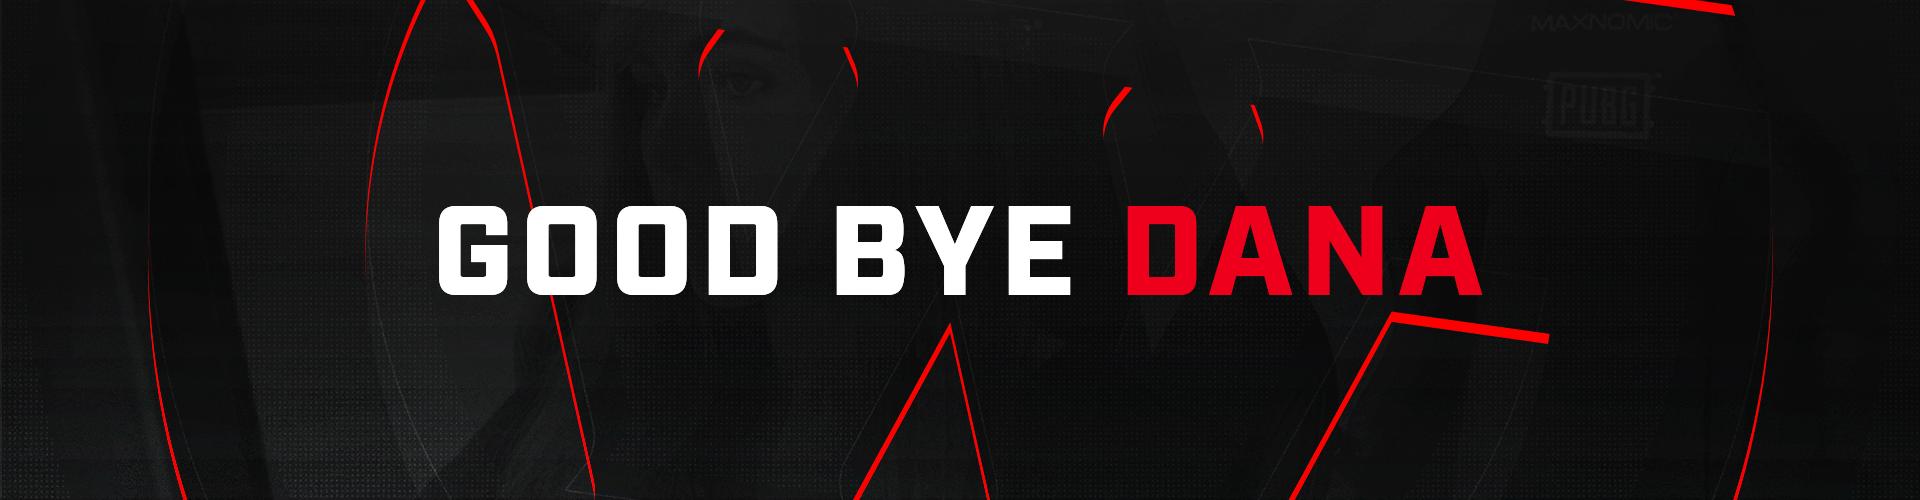 Farewell Danucd